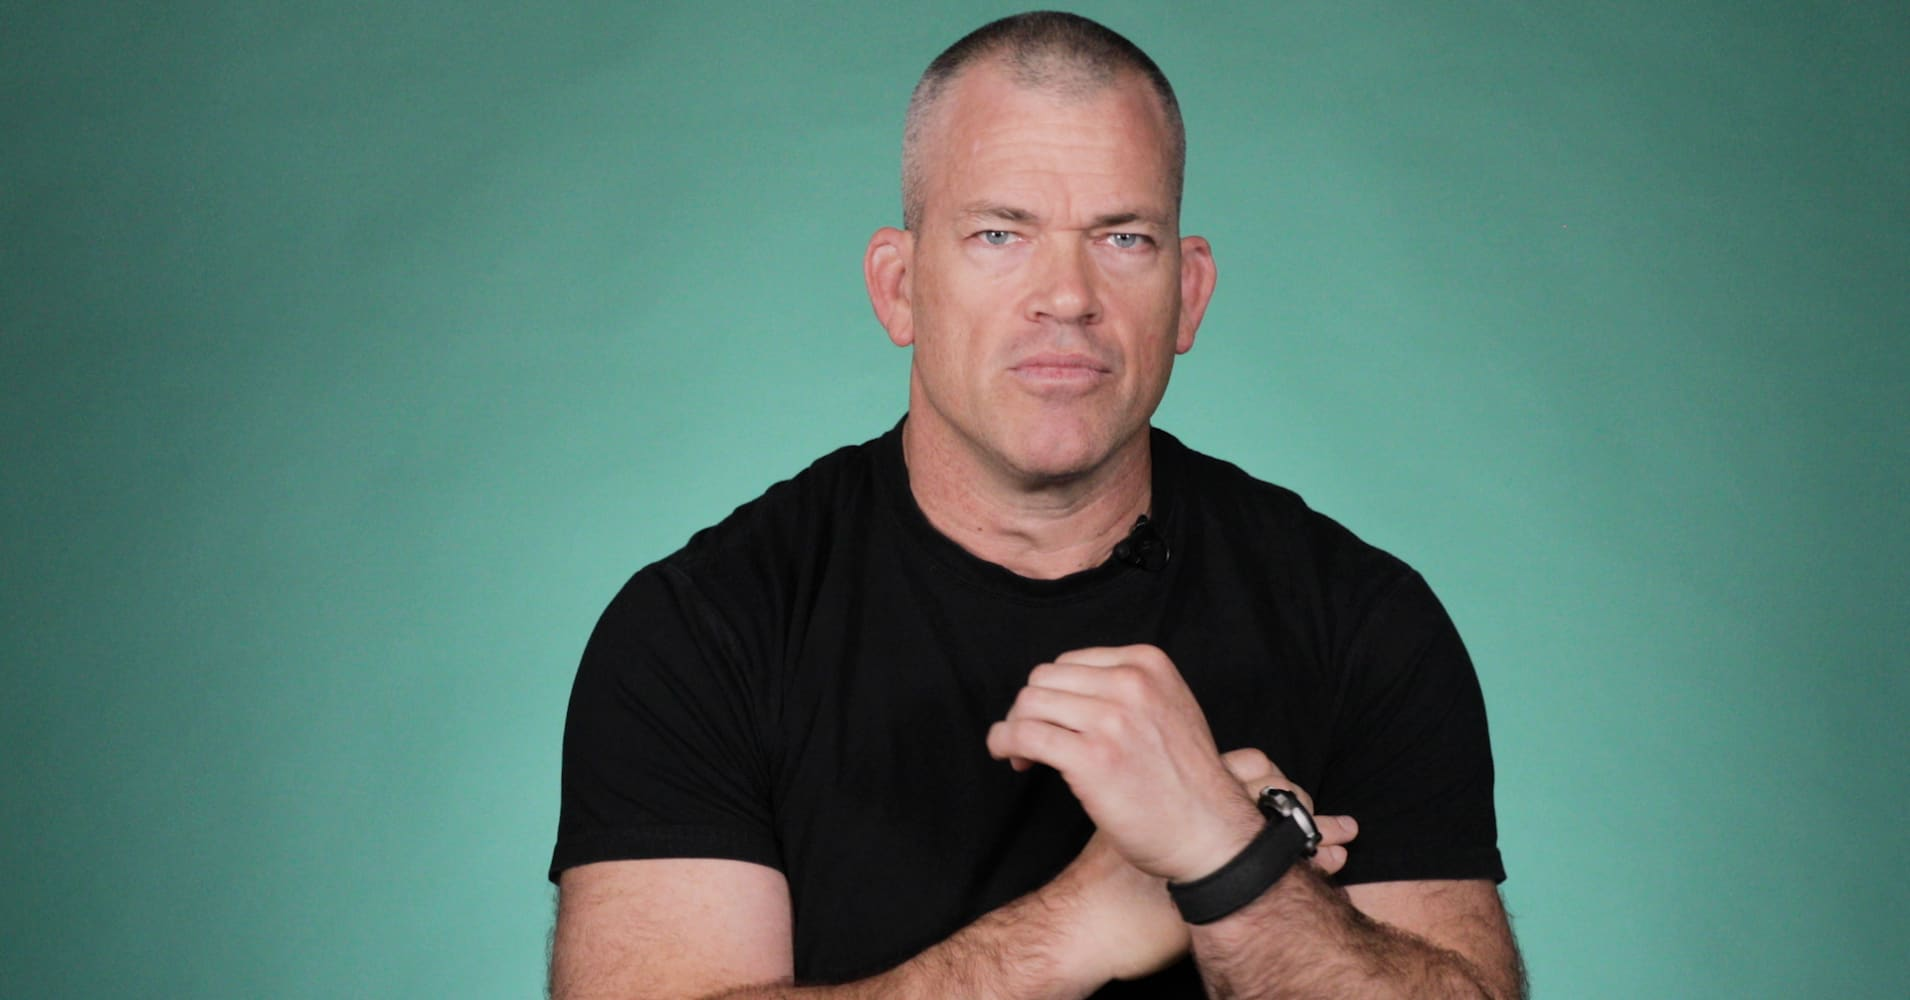 Navy SEAL commander: Why so many successful people like Joe Rogan and Demi Lovato practice jiu-jitsu